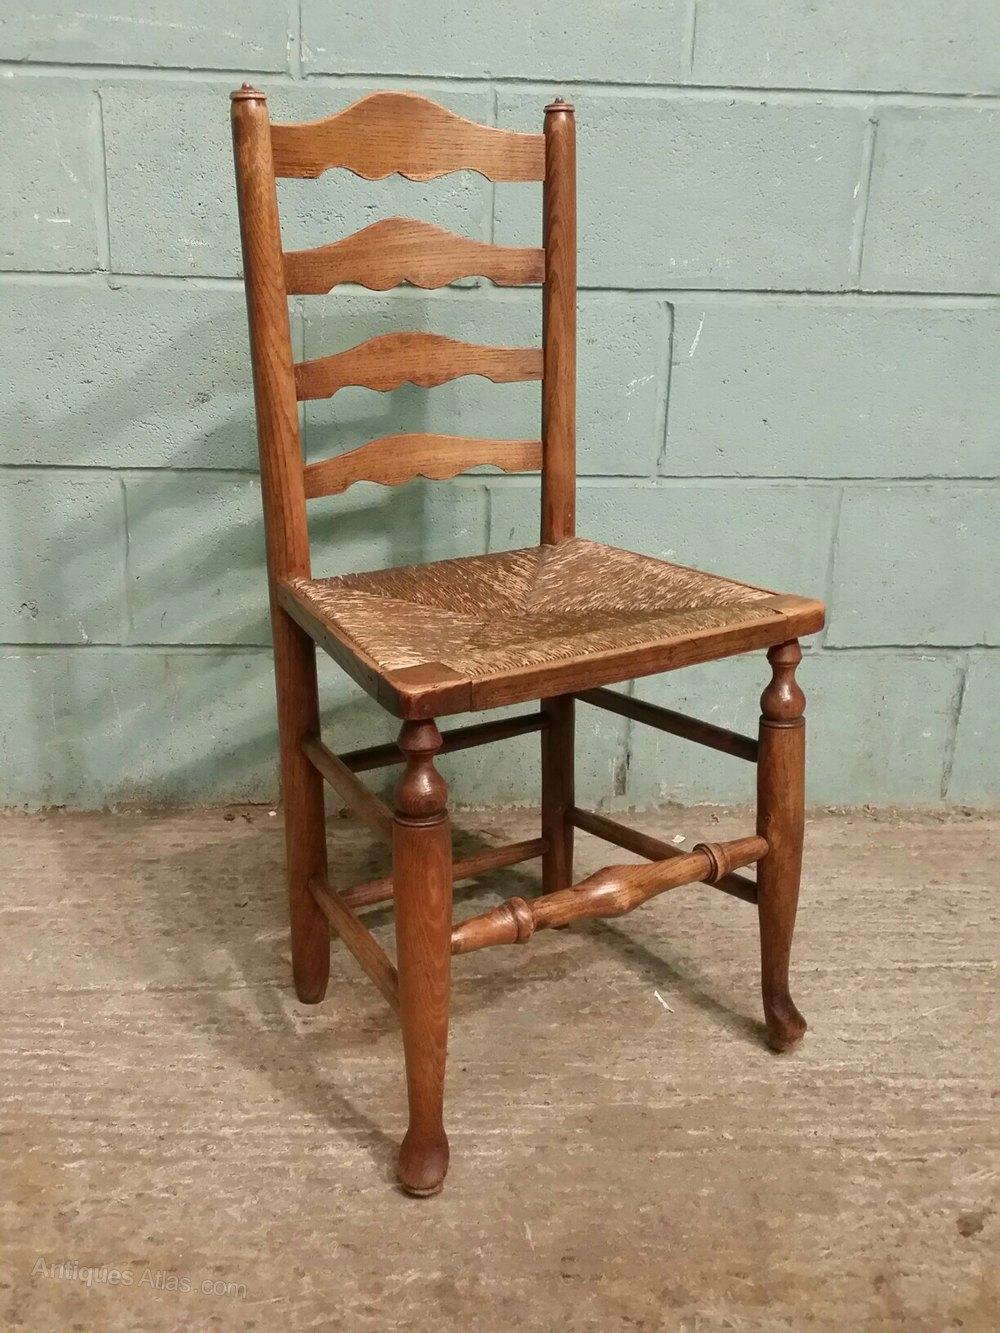 vintage ladderback chair - Antique Ladderback Chair The Best Chair Review  Blog - Antique Ladderback Chairs - Antique Ladder Back Chairs For Sale Antique Furniture